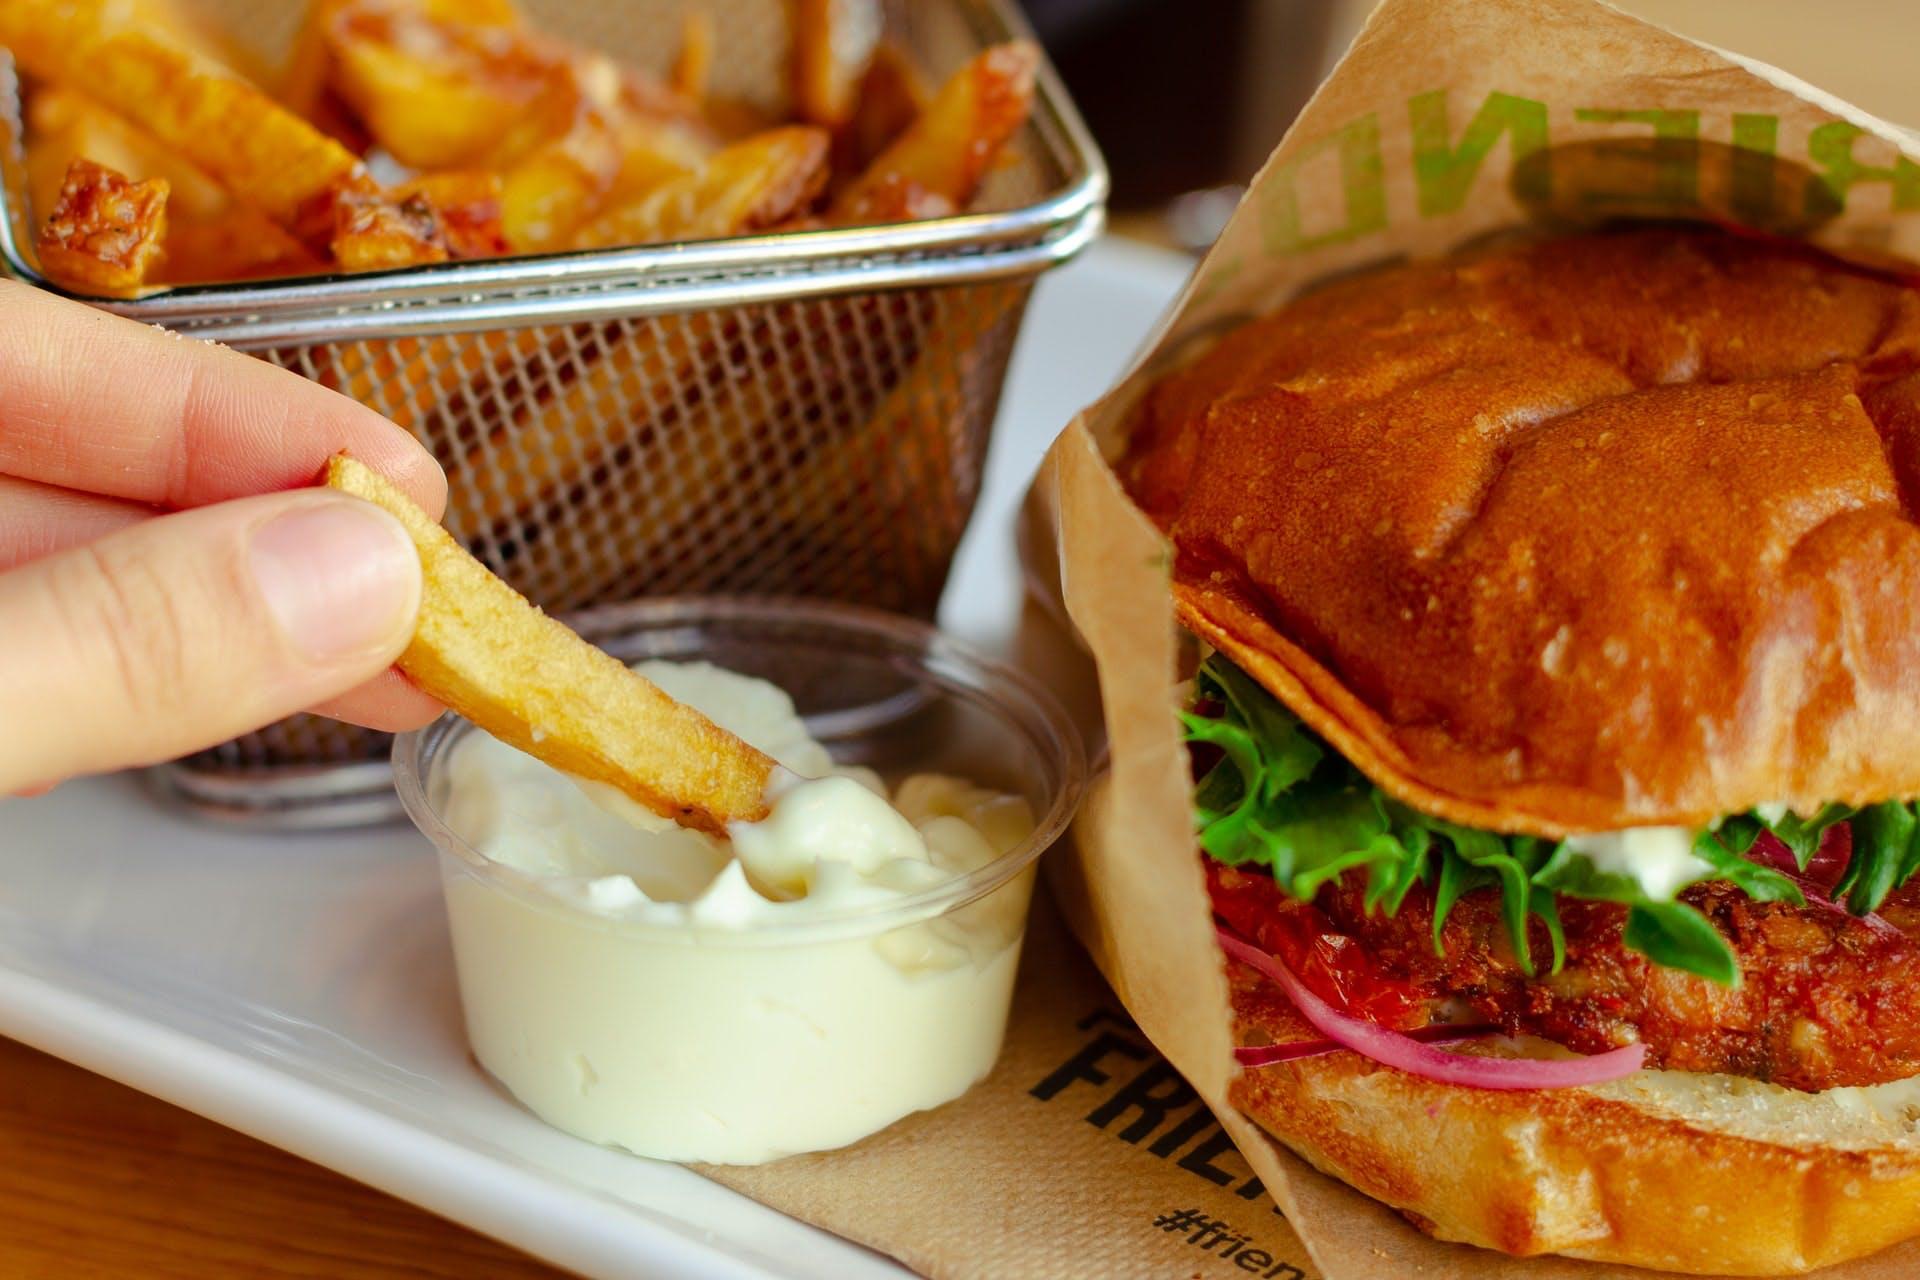 vegan burger and chips